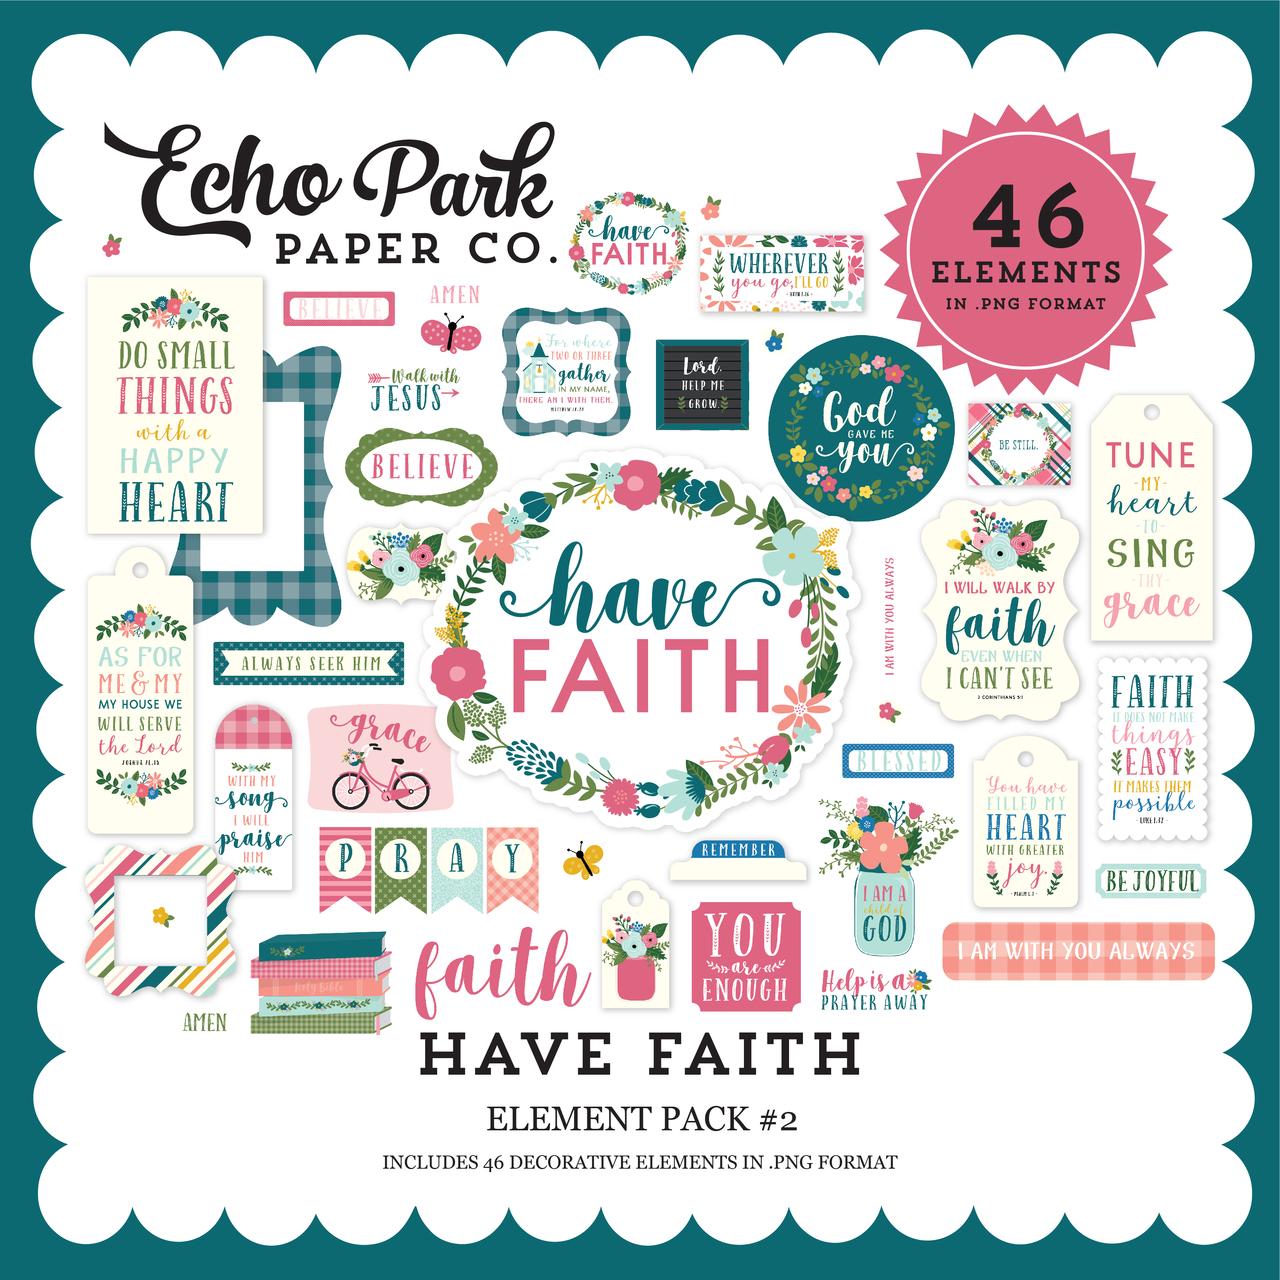 Have Faith Element Pack #2